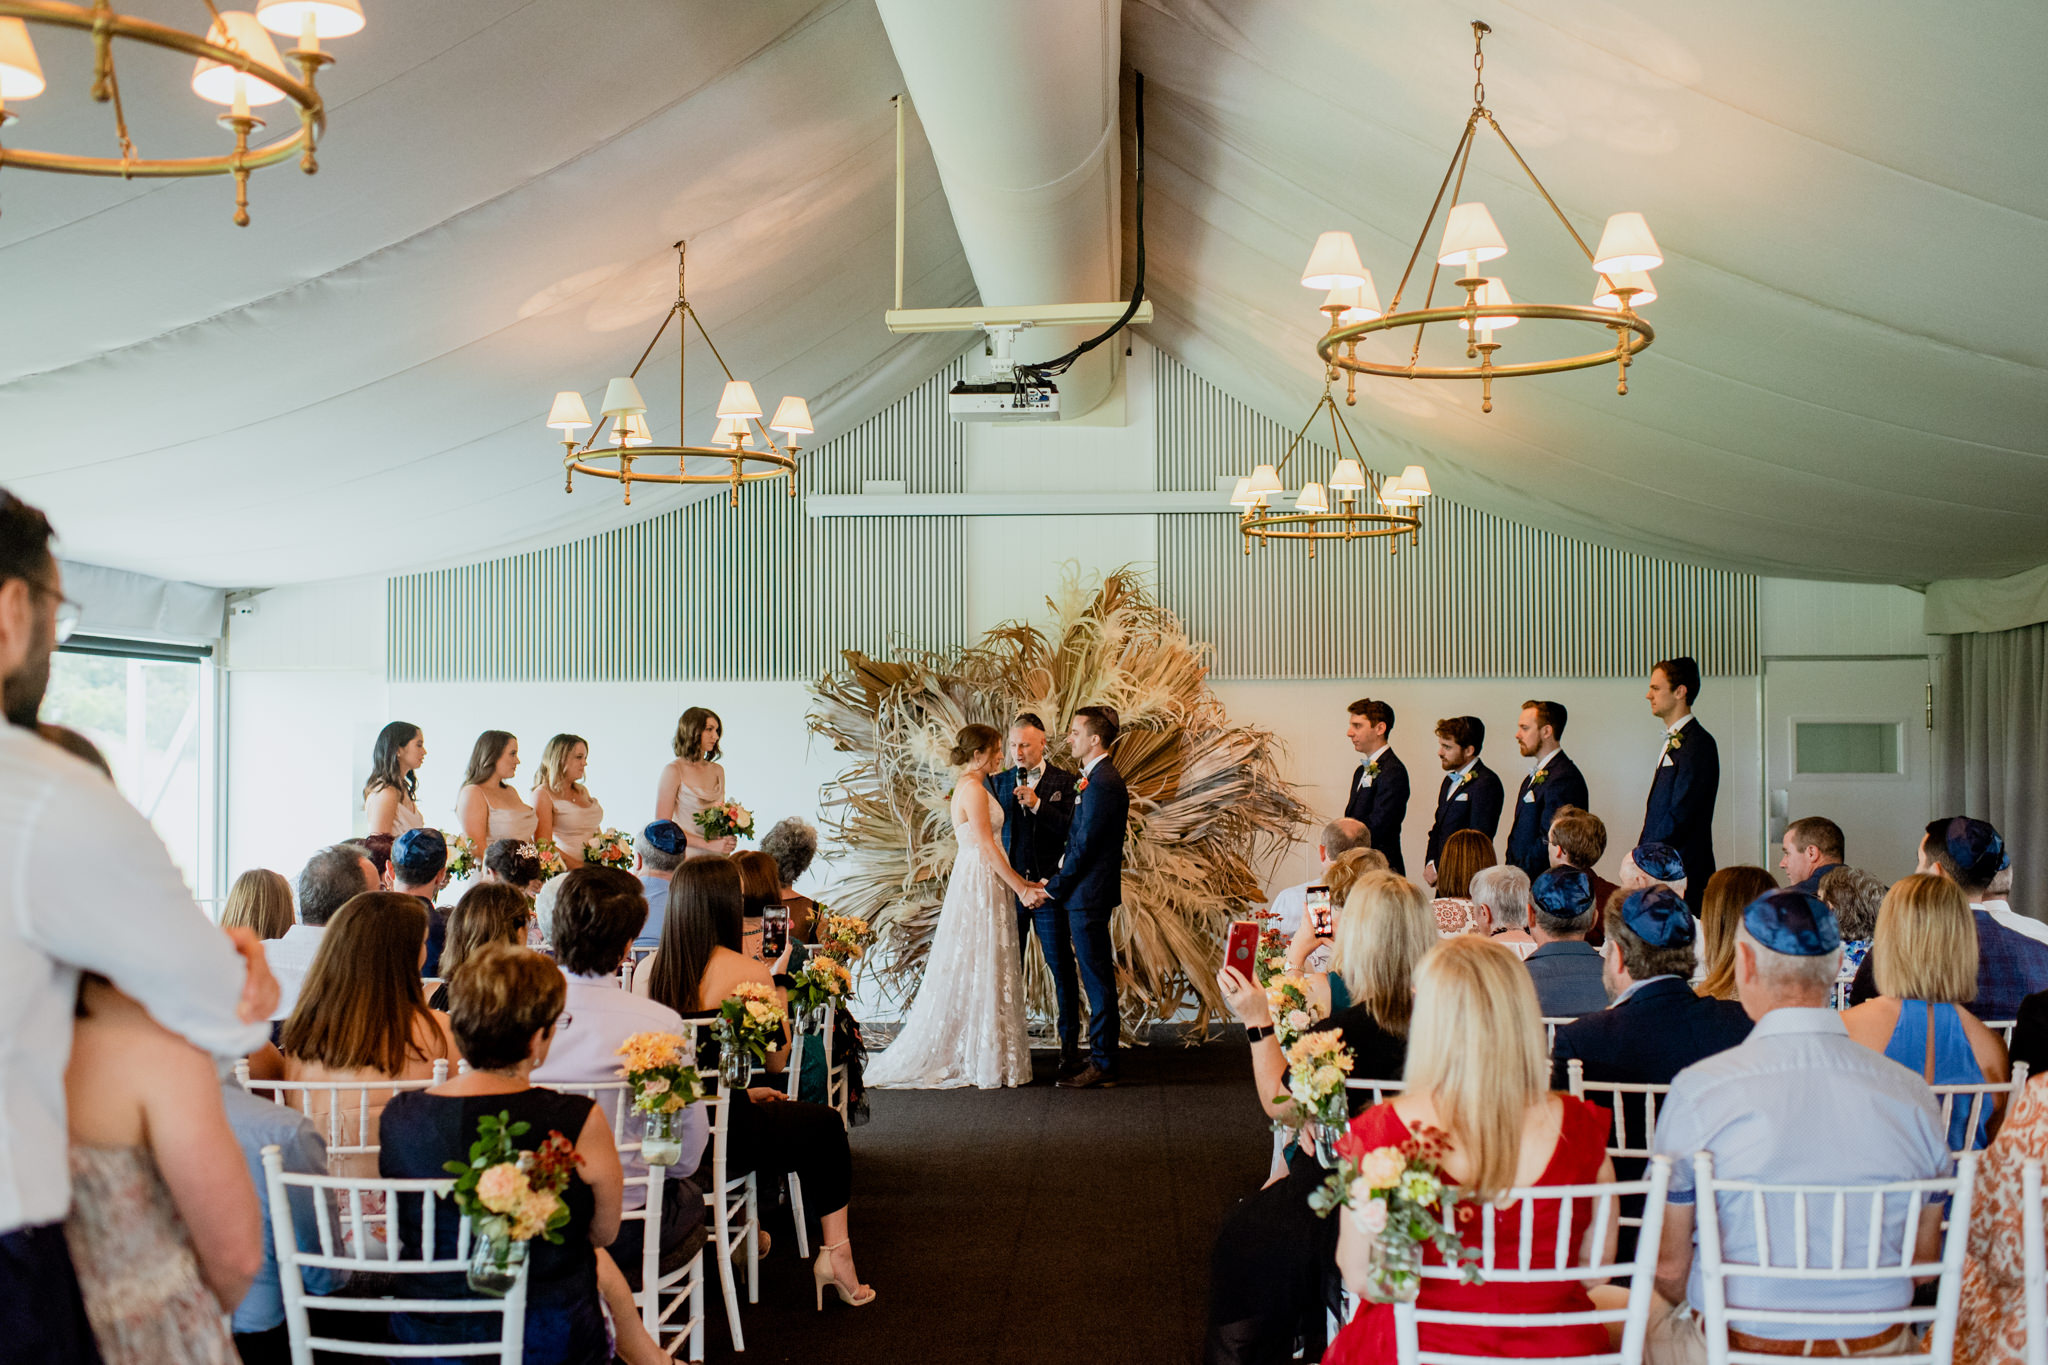 A wedding ceremony held at Victoria Park, Brisbane